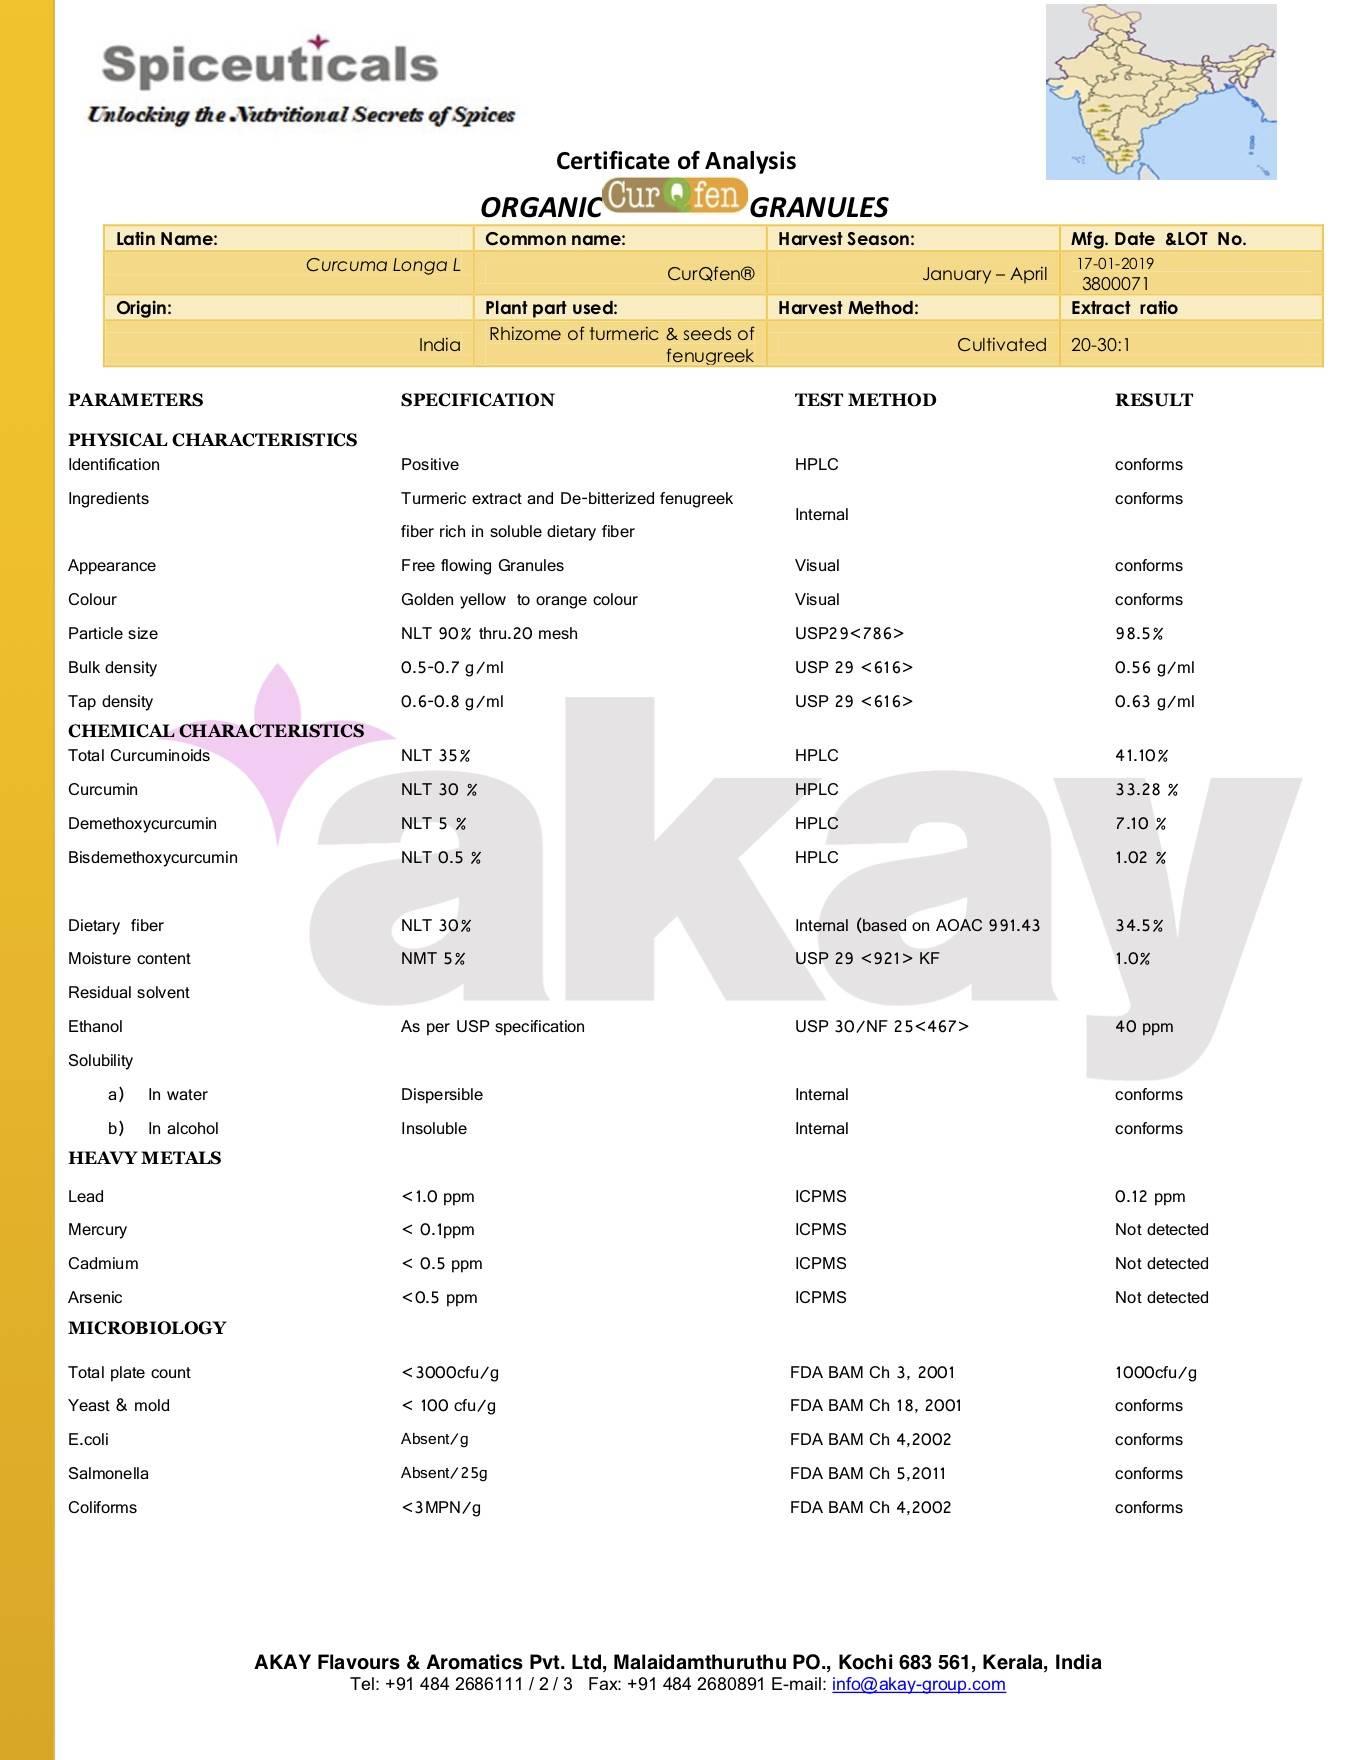 Certificat d'analyse Curqfen bio